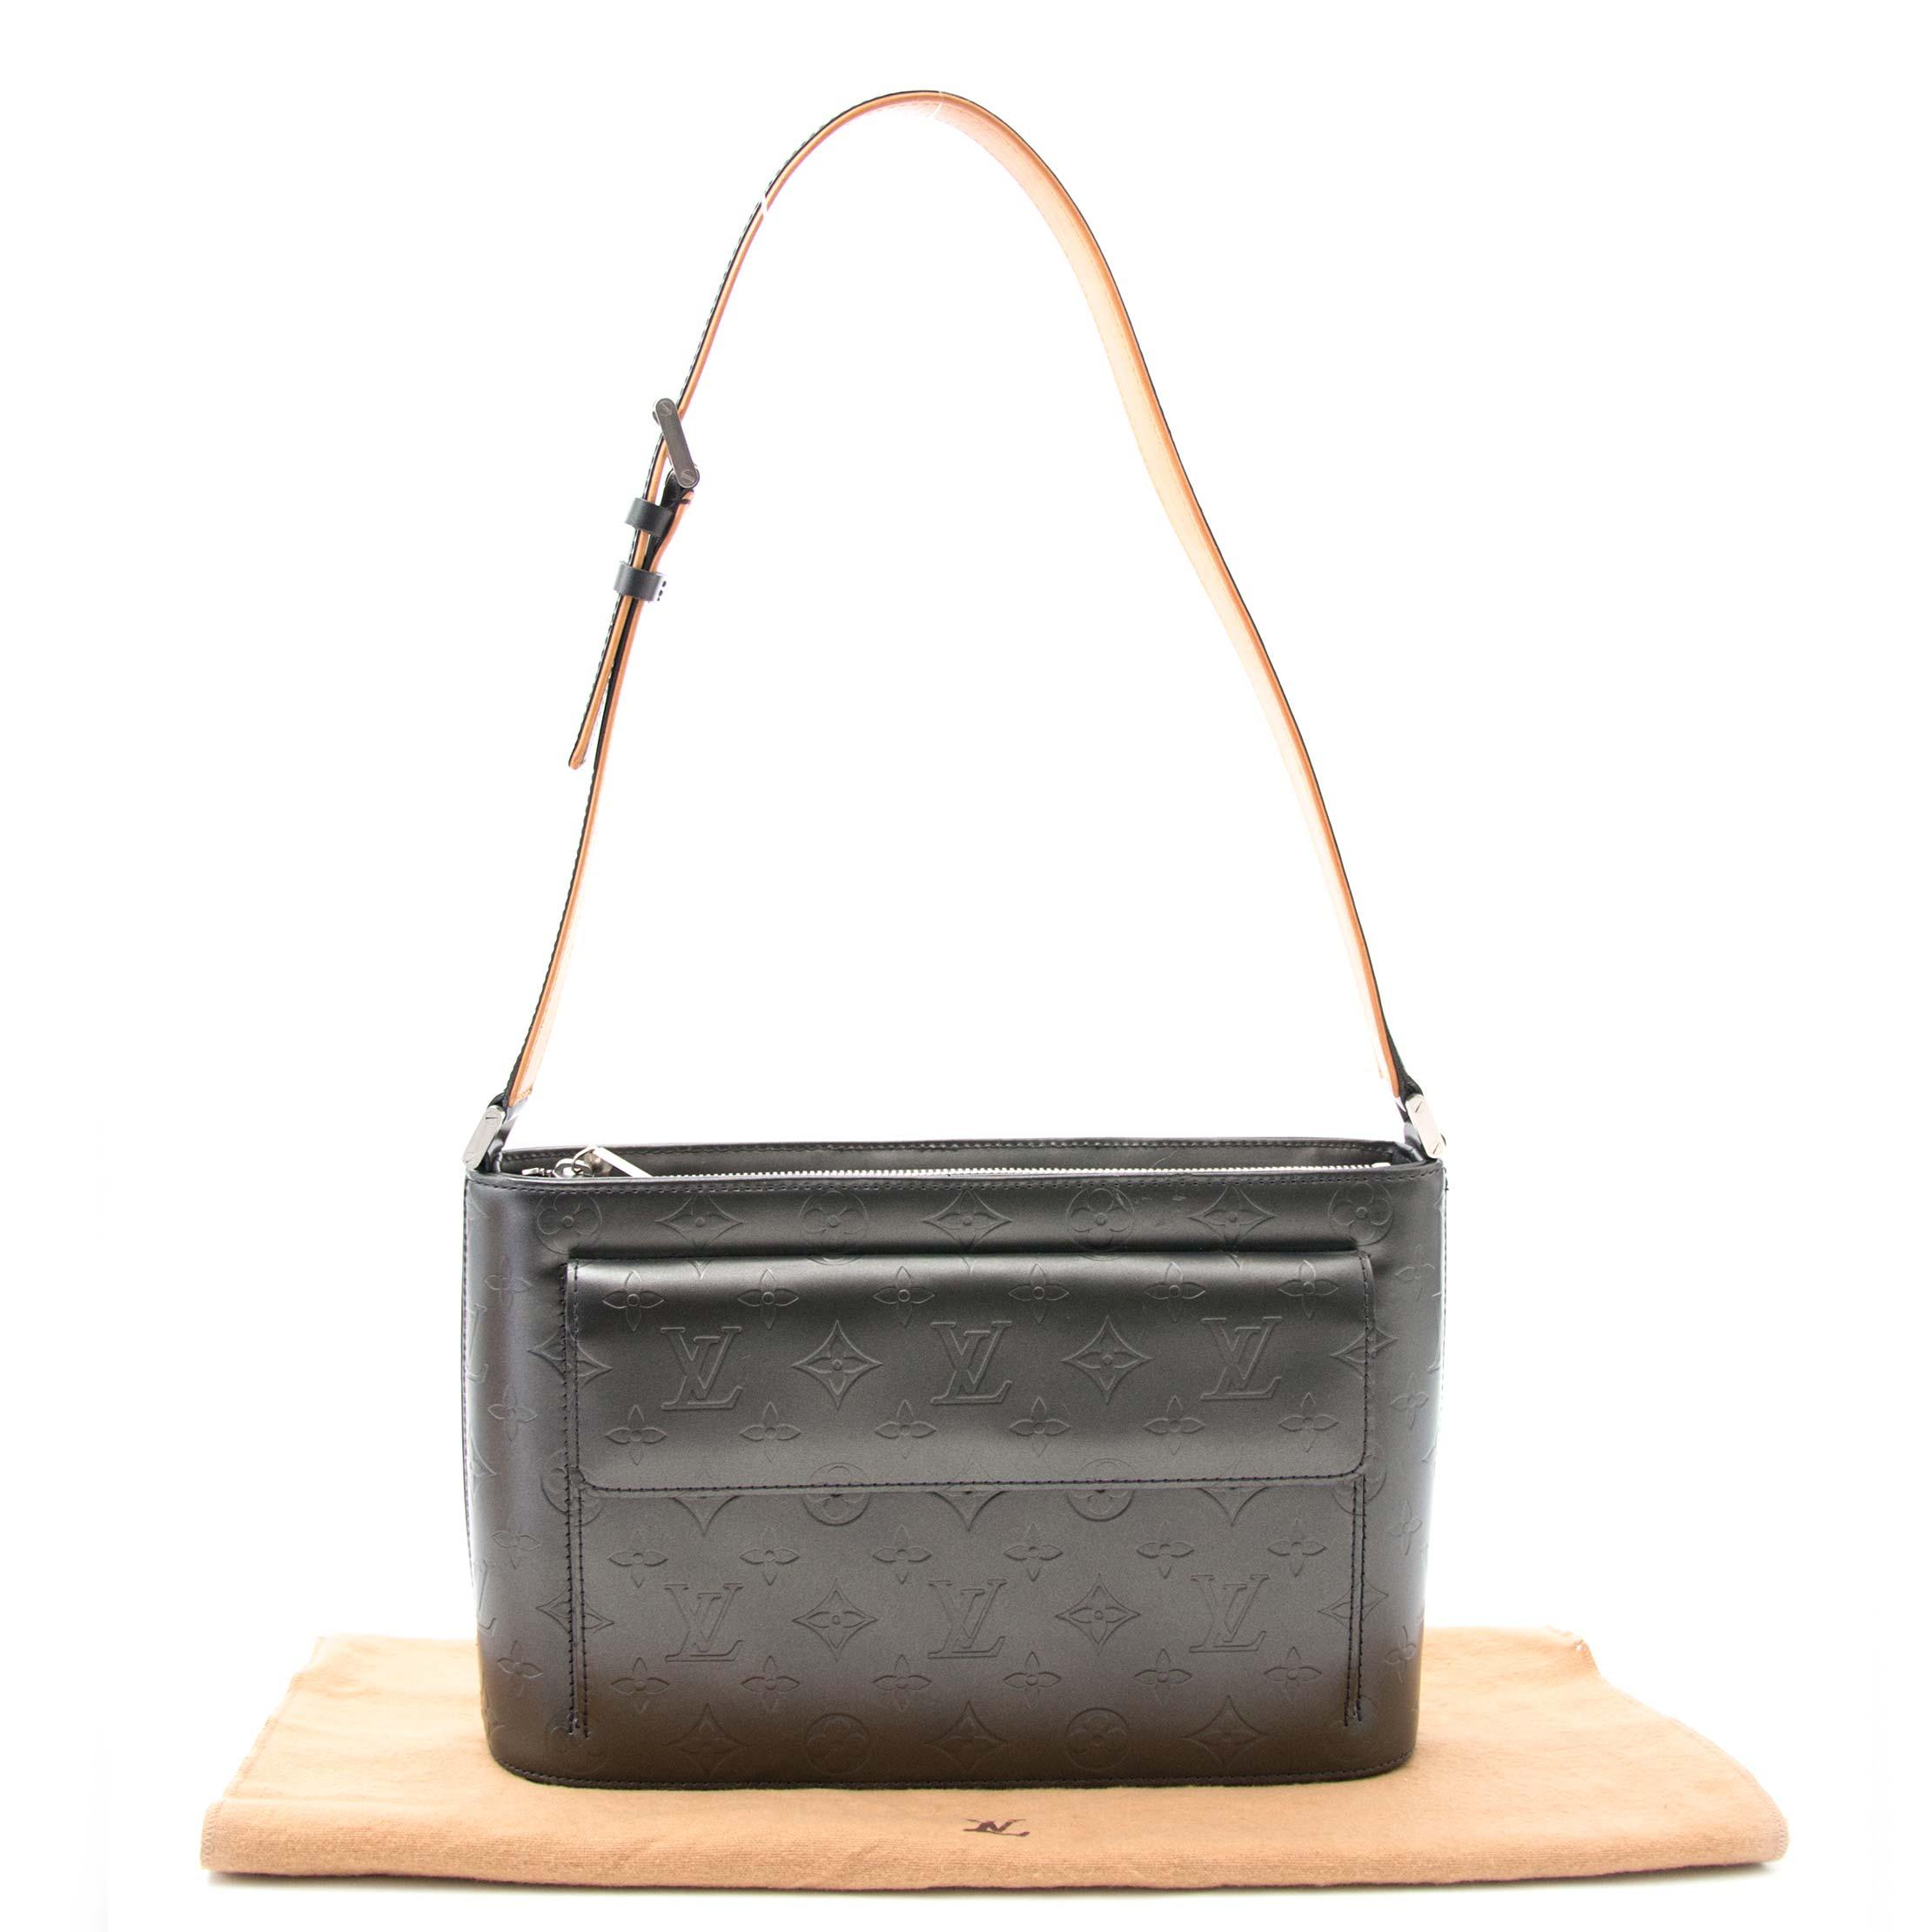 Achetez le Louis Vuitton Metalgun Monogram Mat Alston Bag online or in store at Labellov in Antwerp Belgium, designer items at the best prices, lots of bags and items.